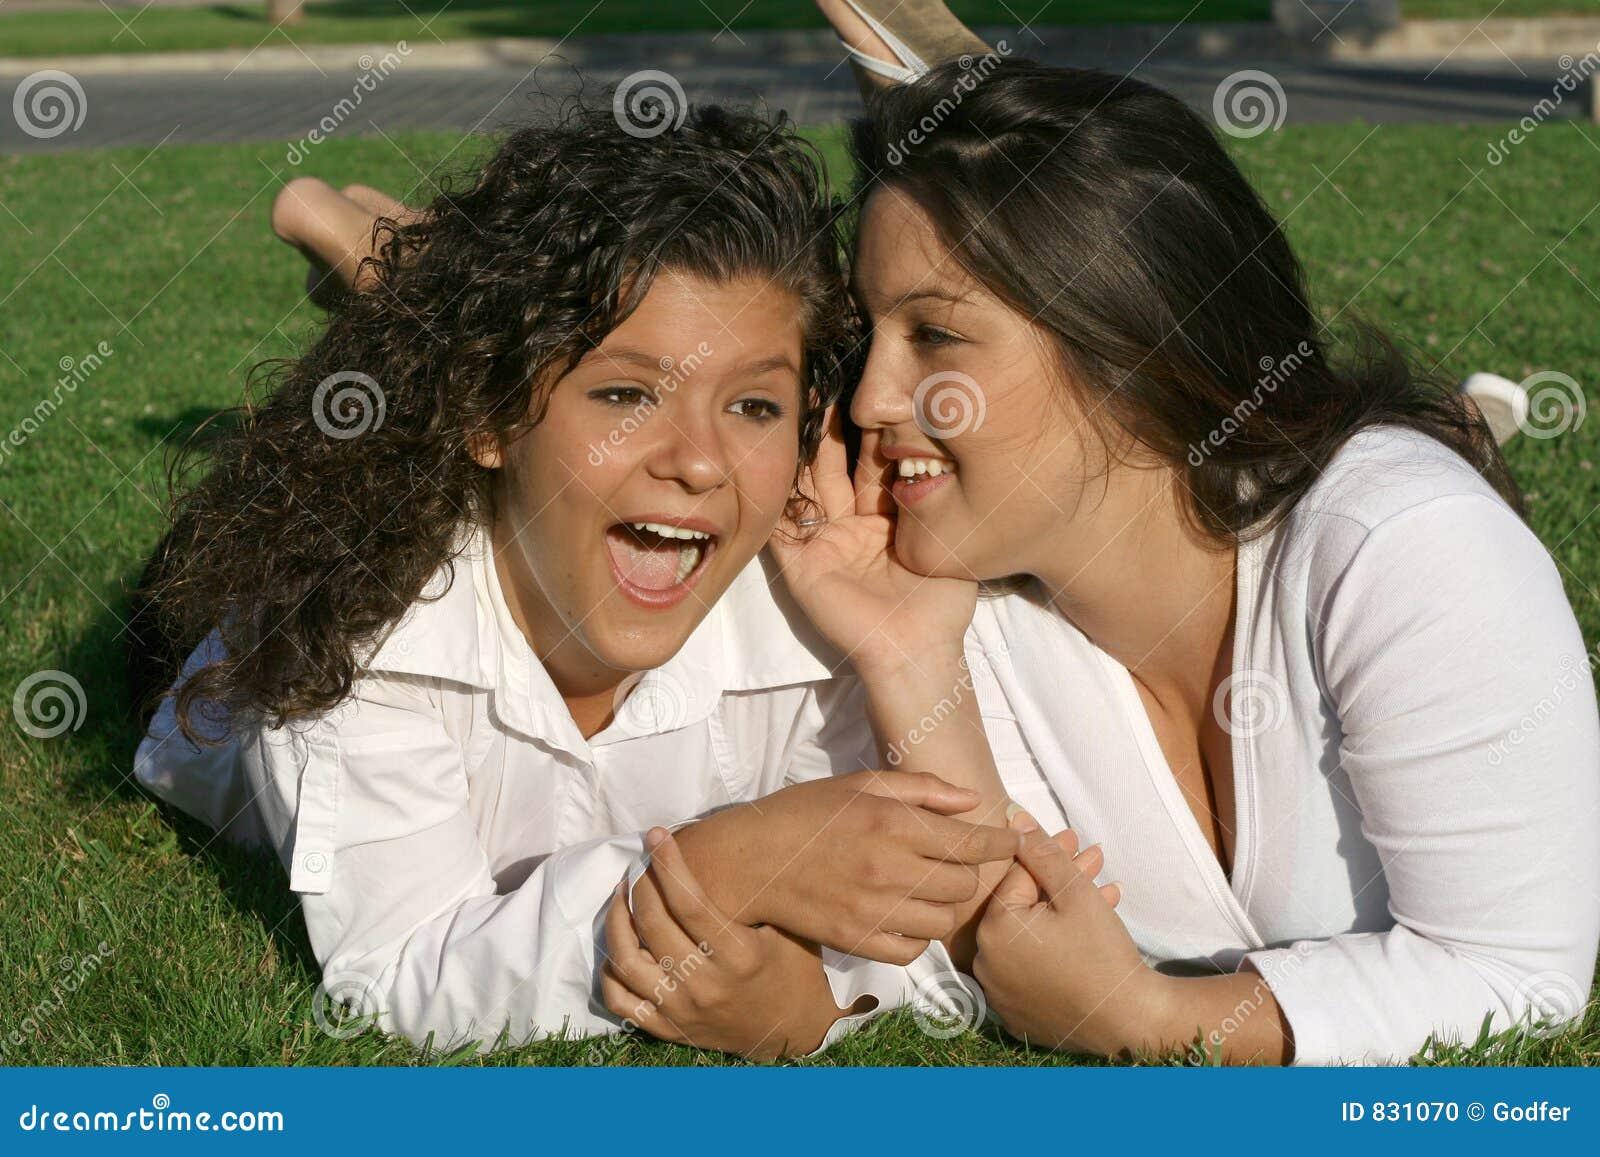 teenagers whispering